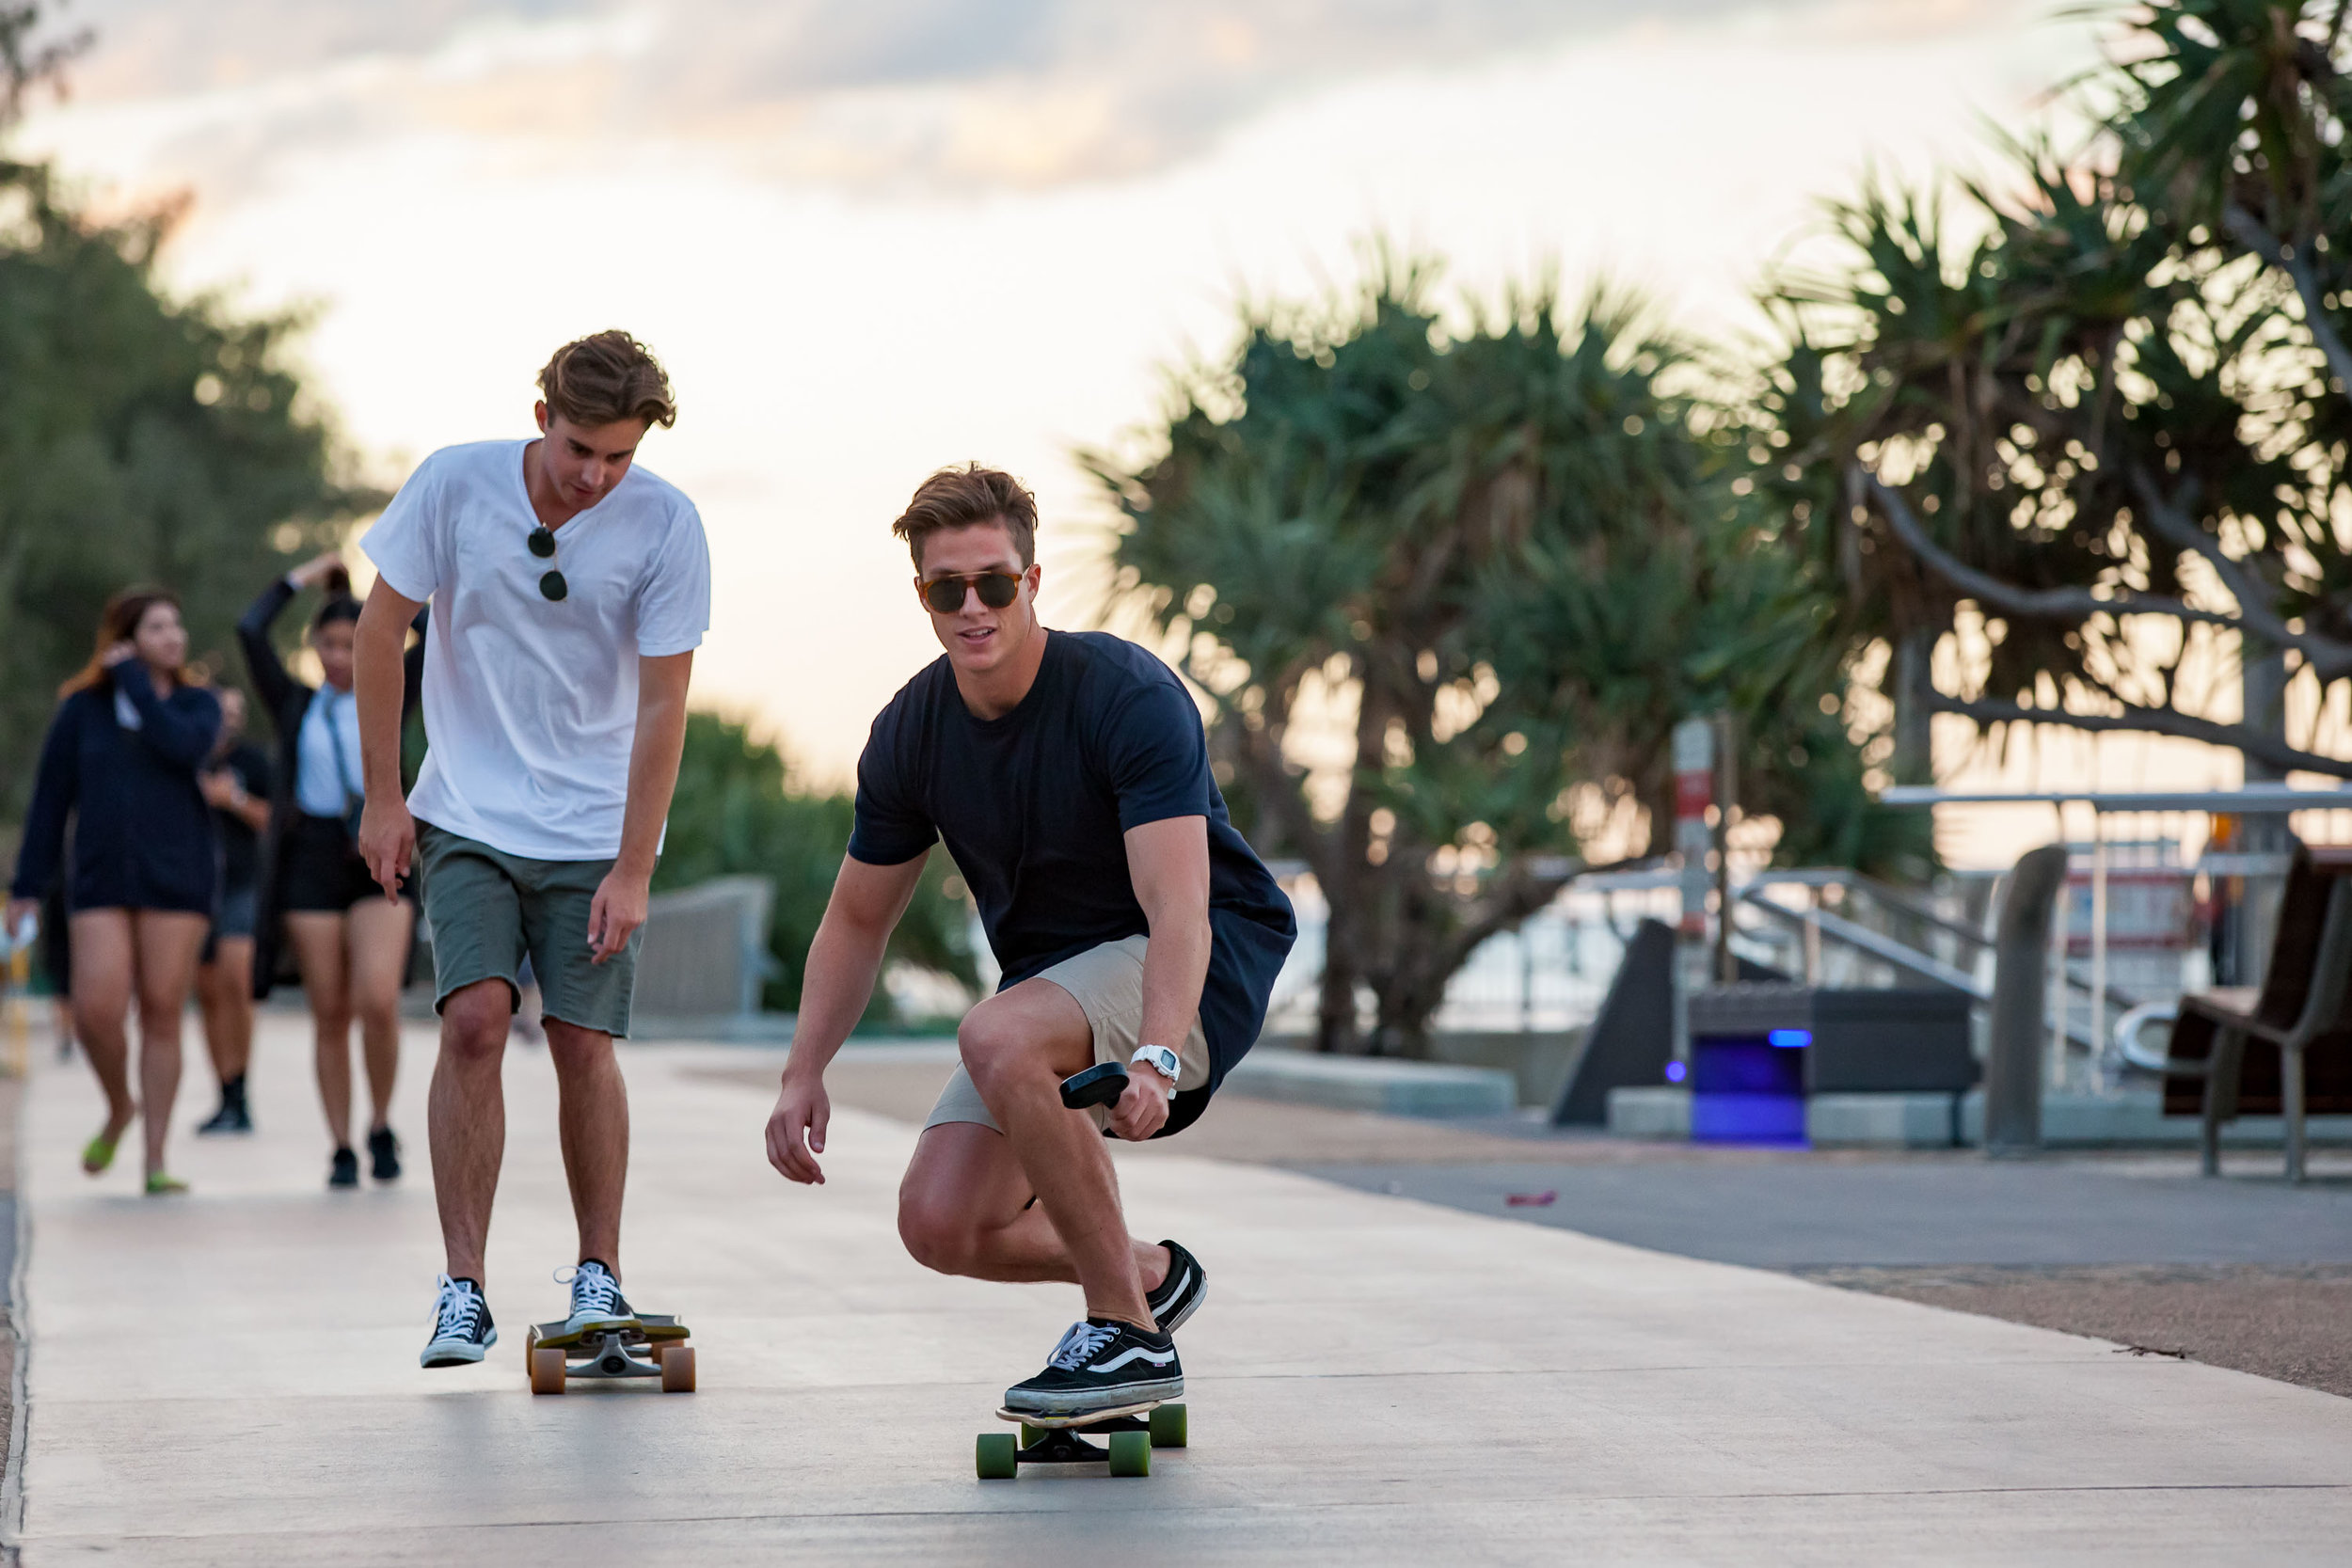 skateboard-d1-lifestyle-13.jpg